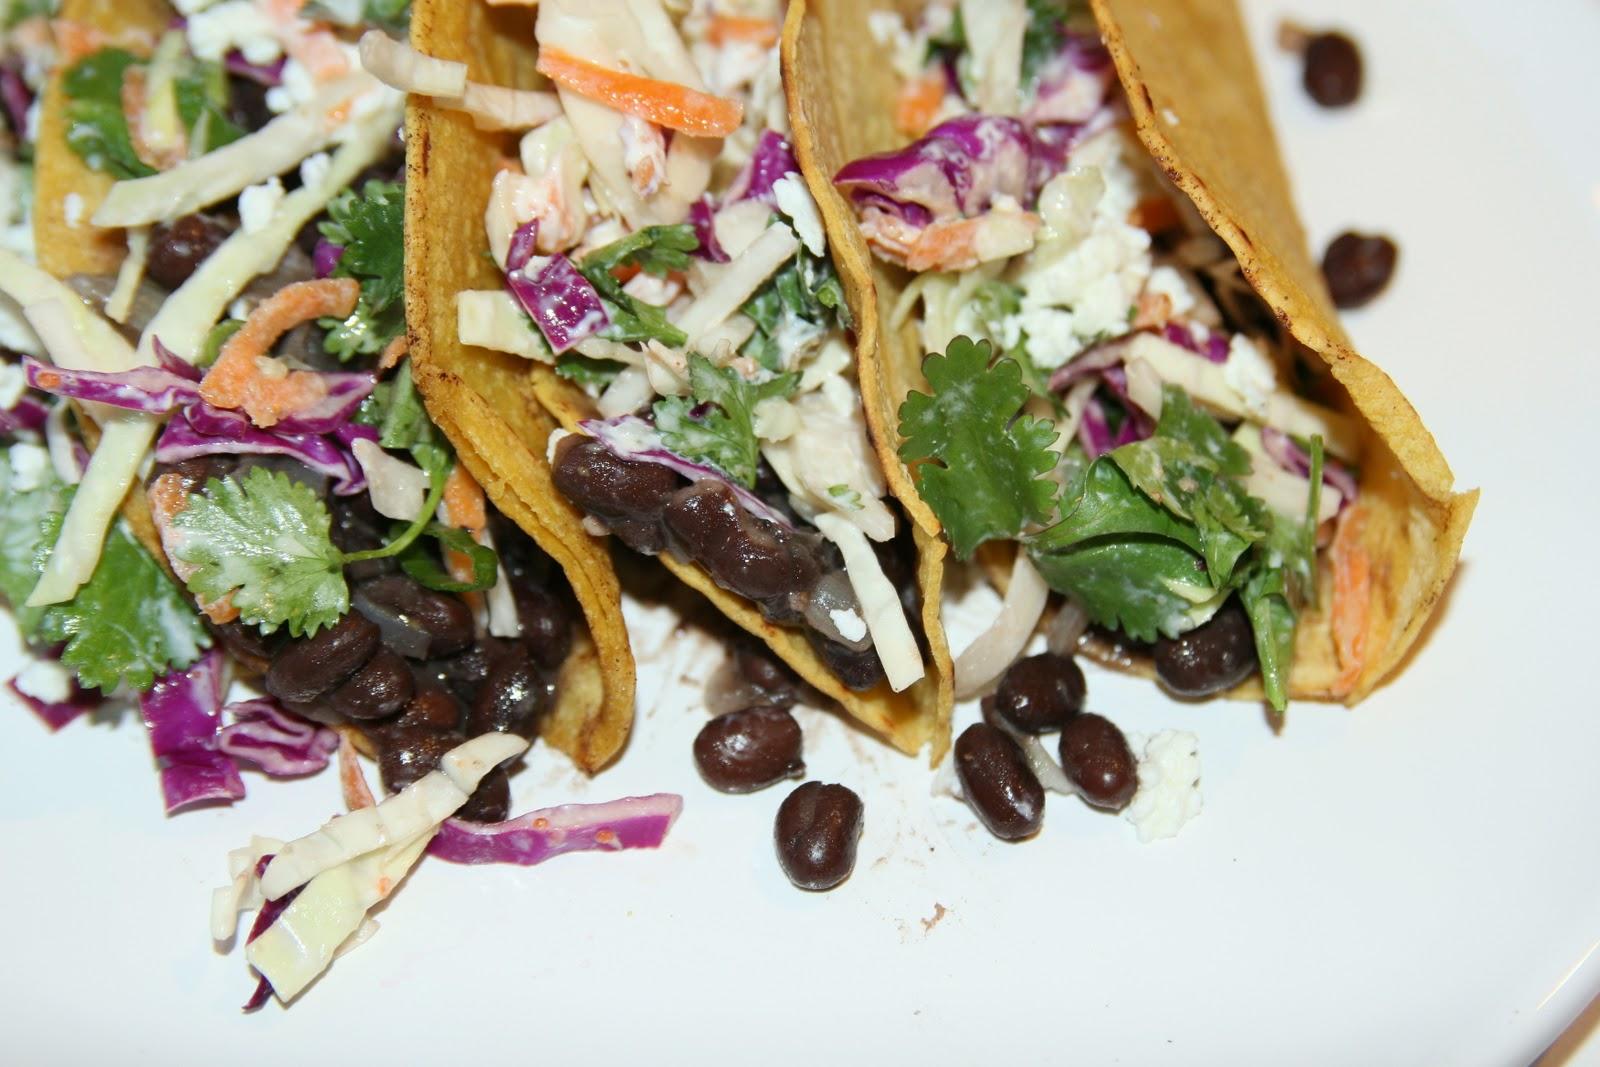 ... & Champagne: Crispy Black Bean Tacos with Feta & Cabbage Slaw